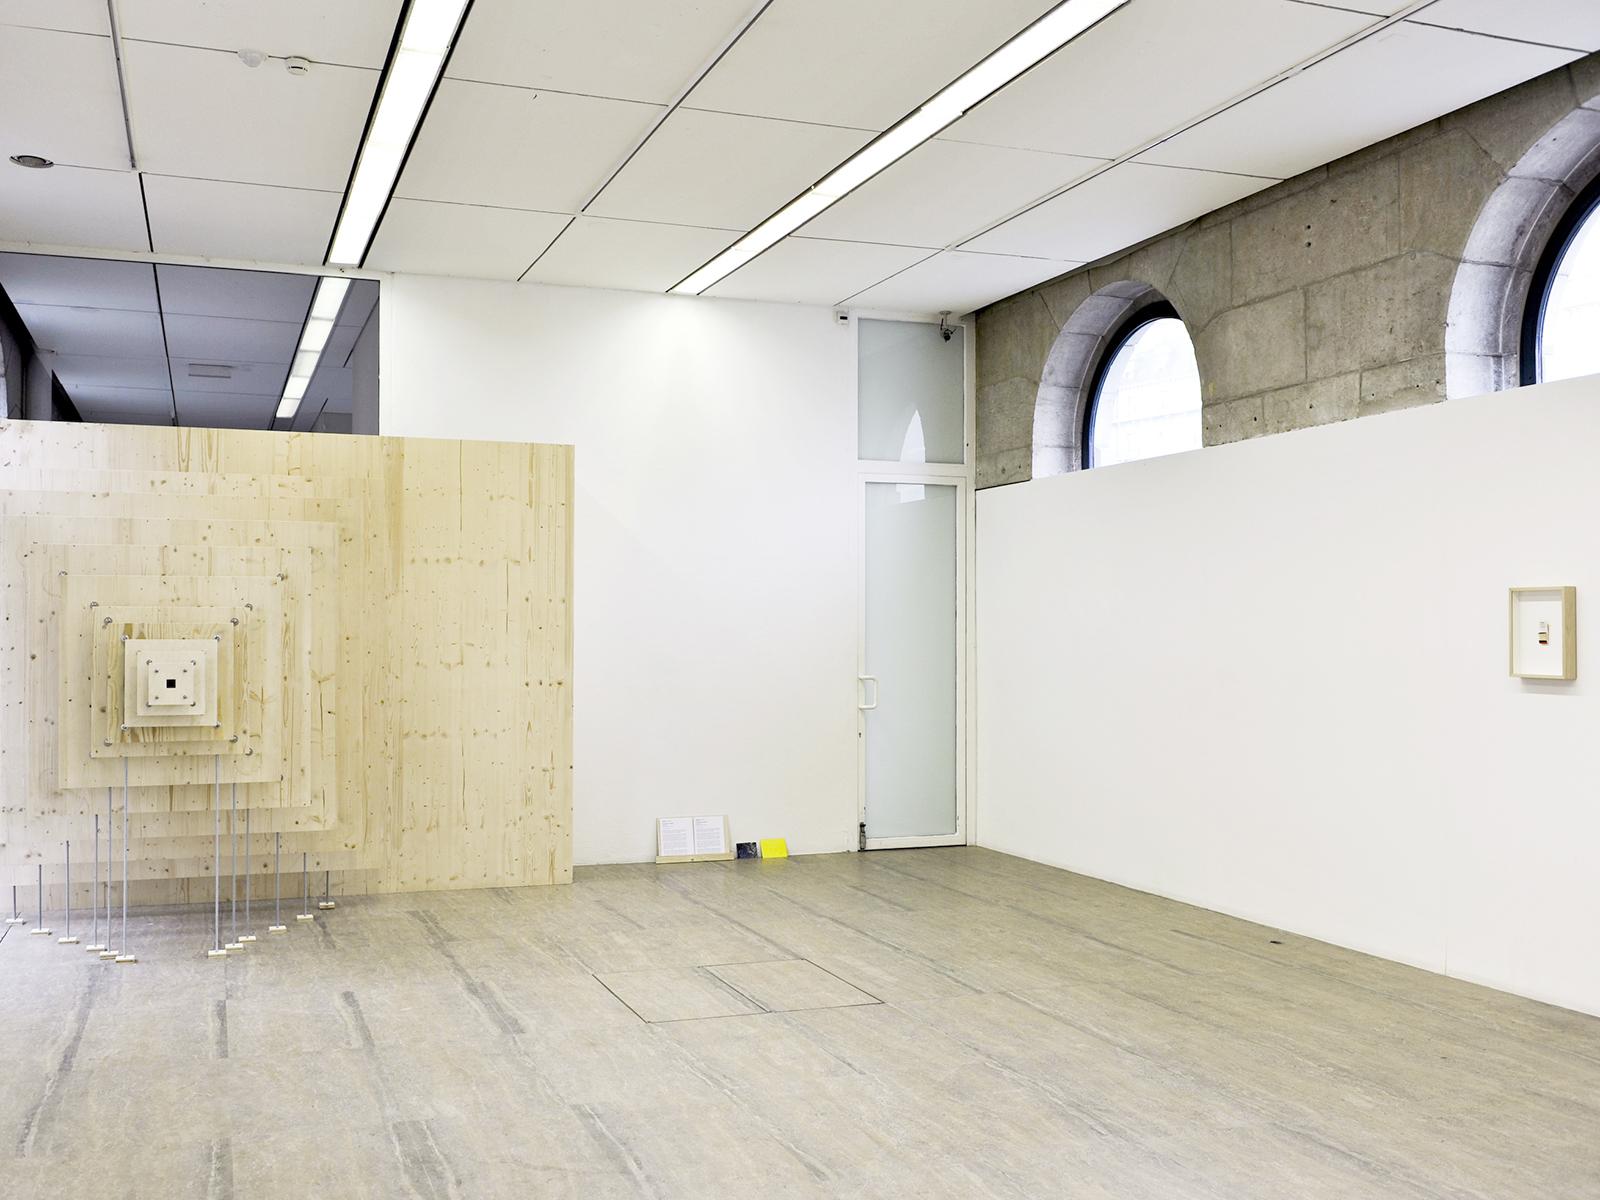 Benoit-Delaunay-artiste-installations-Un Sentiment de Chaleur-04